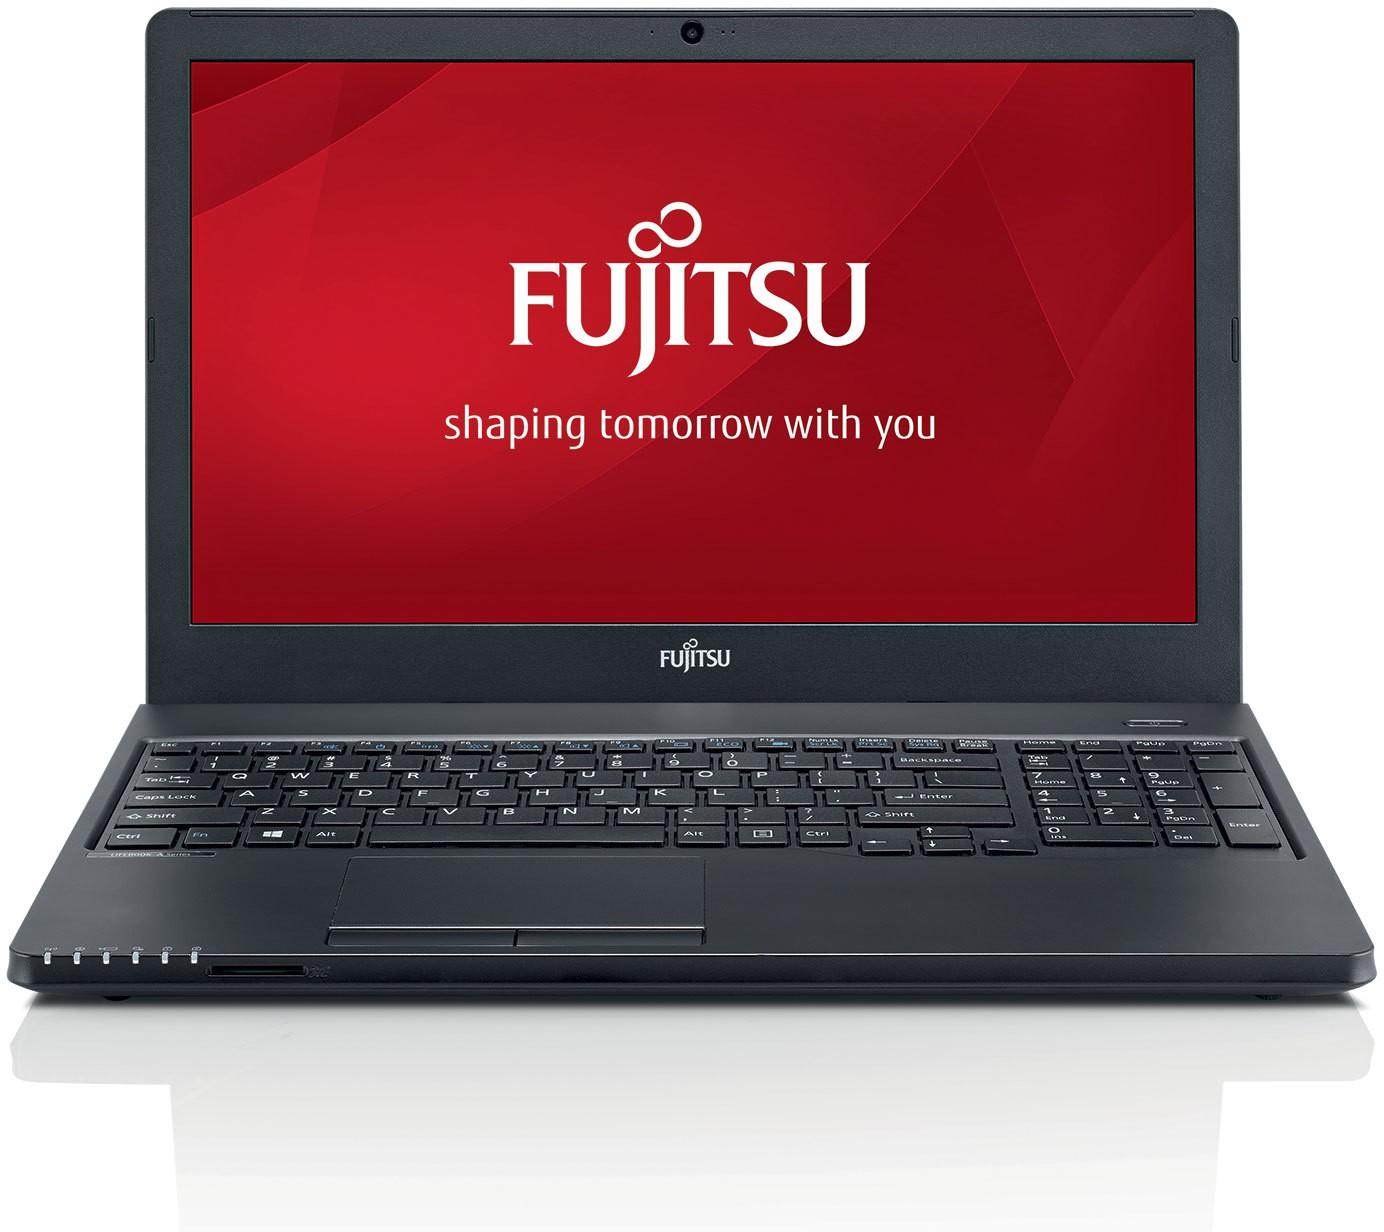 Fujitsu Lifebook Core i3 5th Gen - (8 GB/500 GB HDD/DOS) Lifebook A555 Notebook(15.6 inch, Black) (Fujitsu) Bengaluru Buy Online